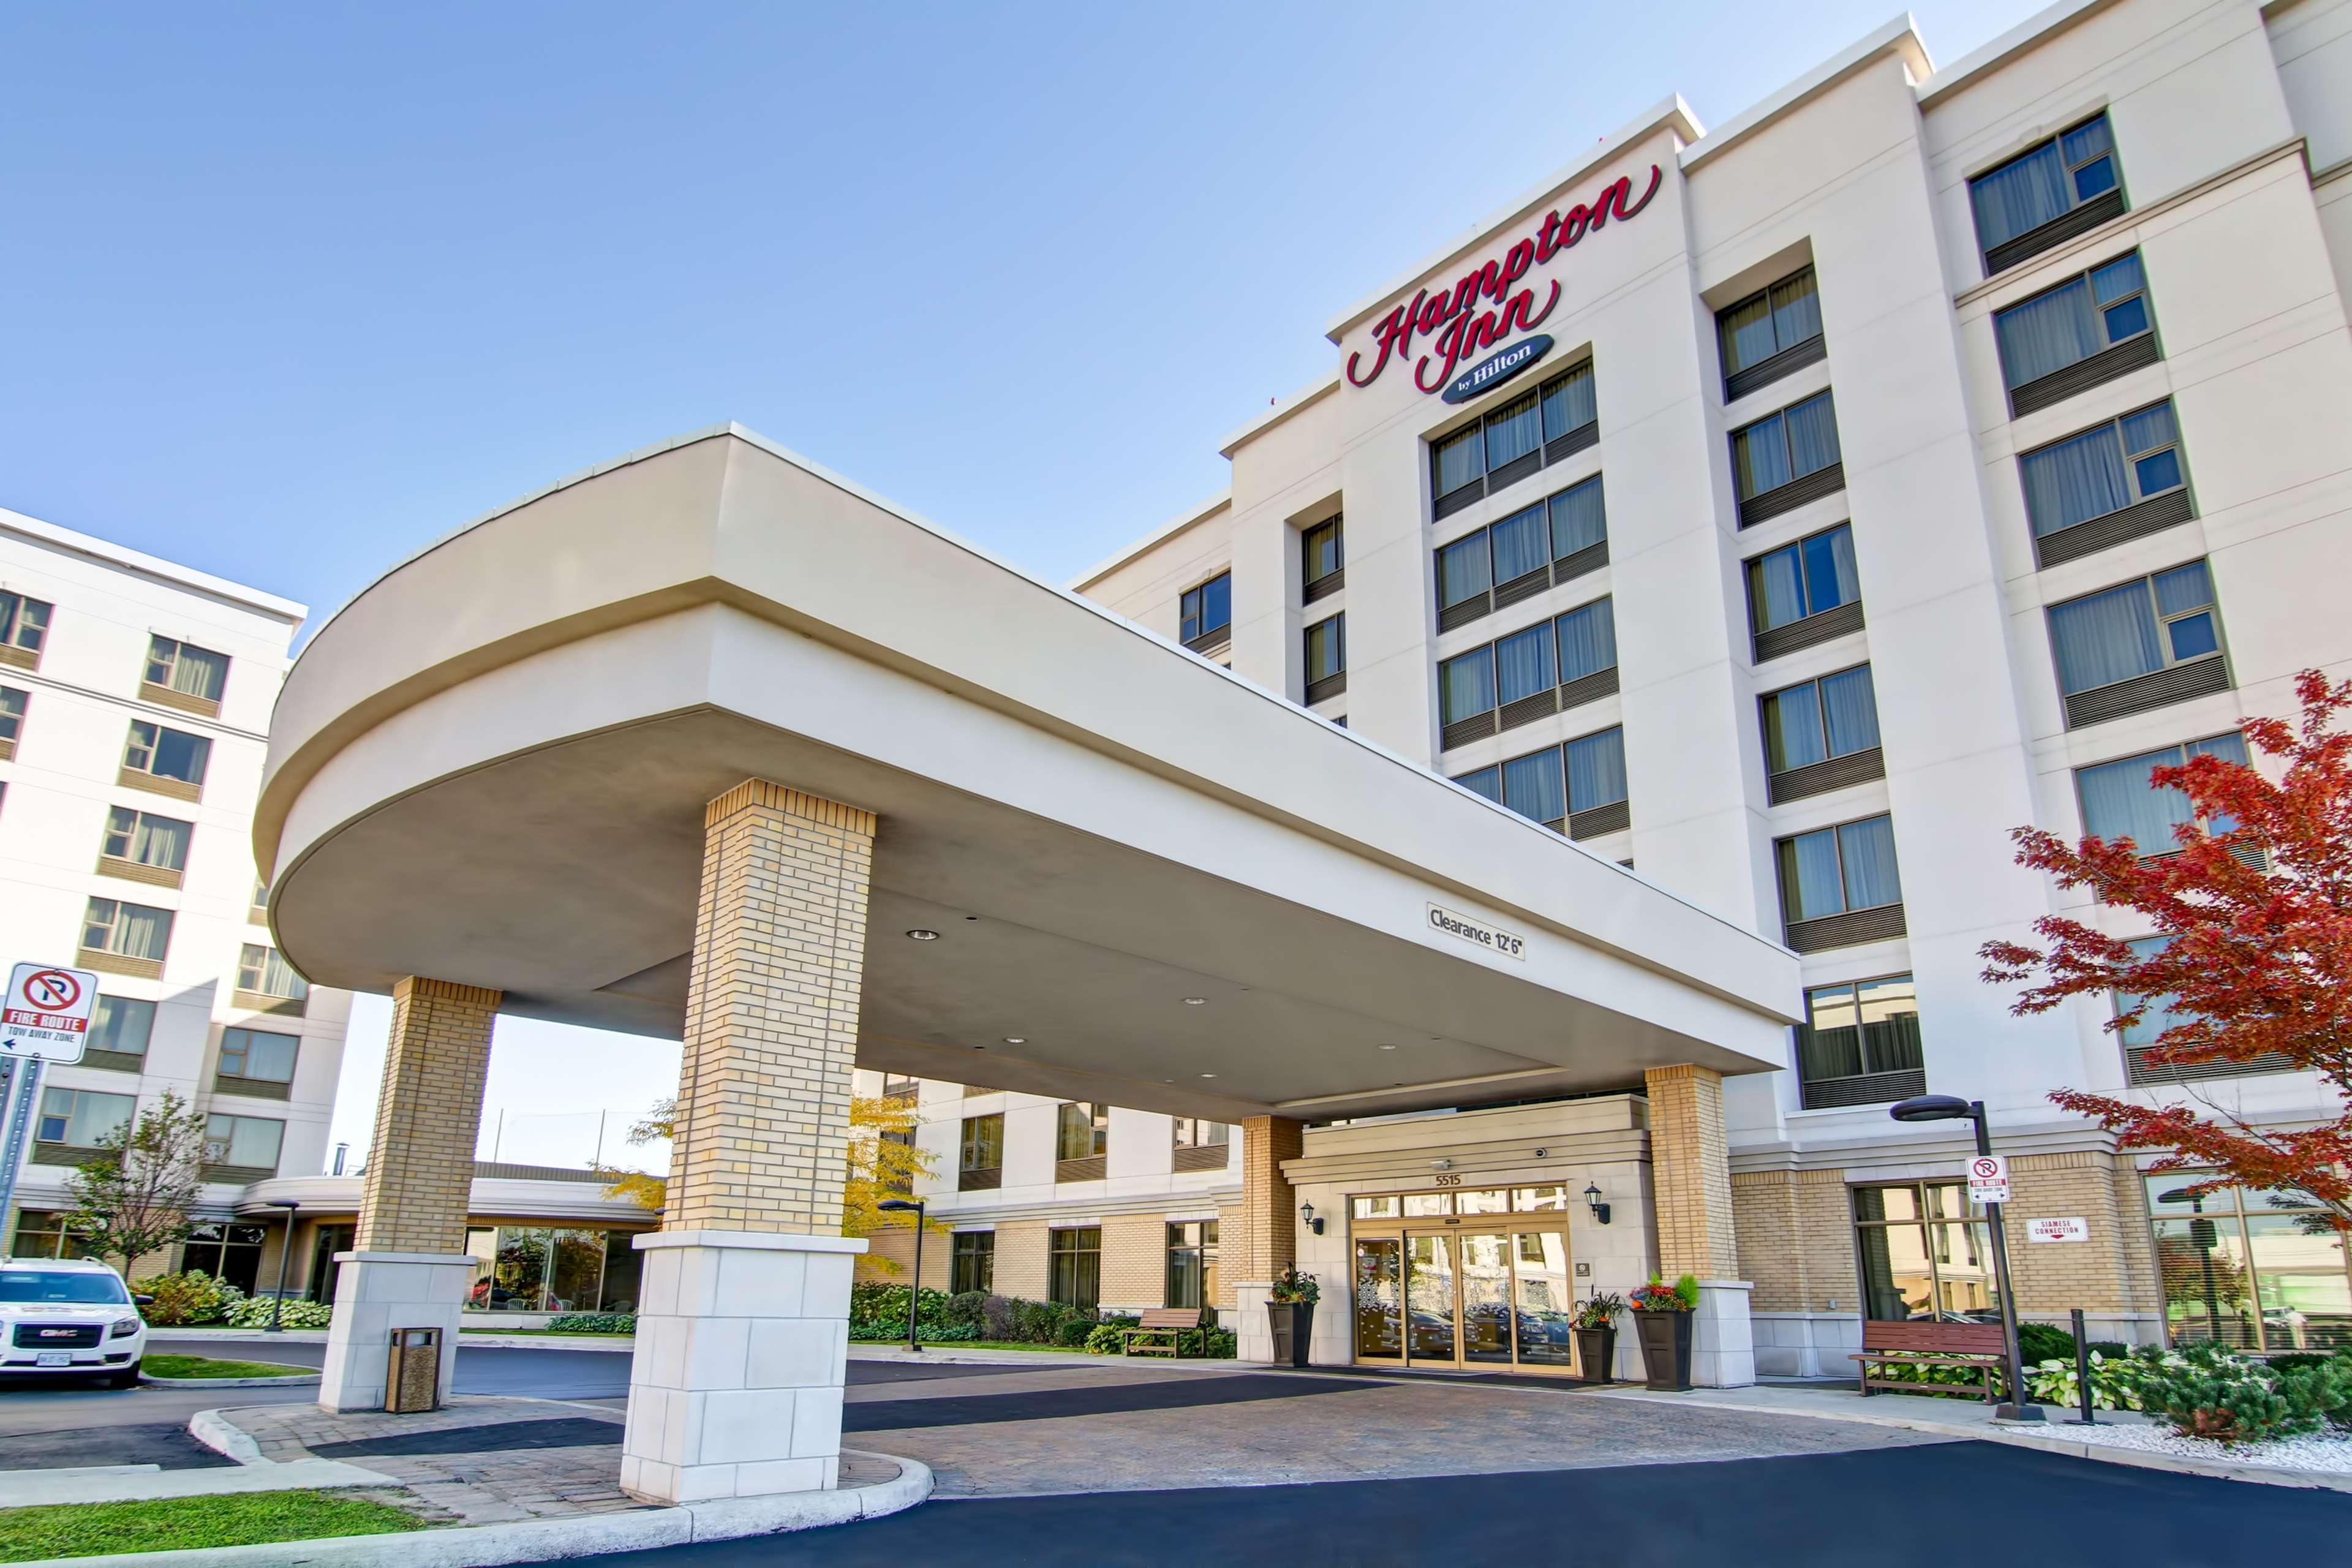 Hampton Inn by Hilton Toronto Airport Corporate Centre - Toronto, ON M9C 5K5 - (416)646-3000 | ShowMeLocal.com